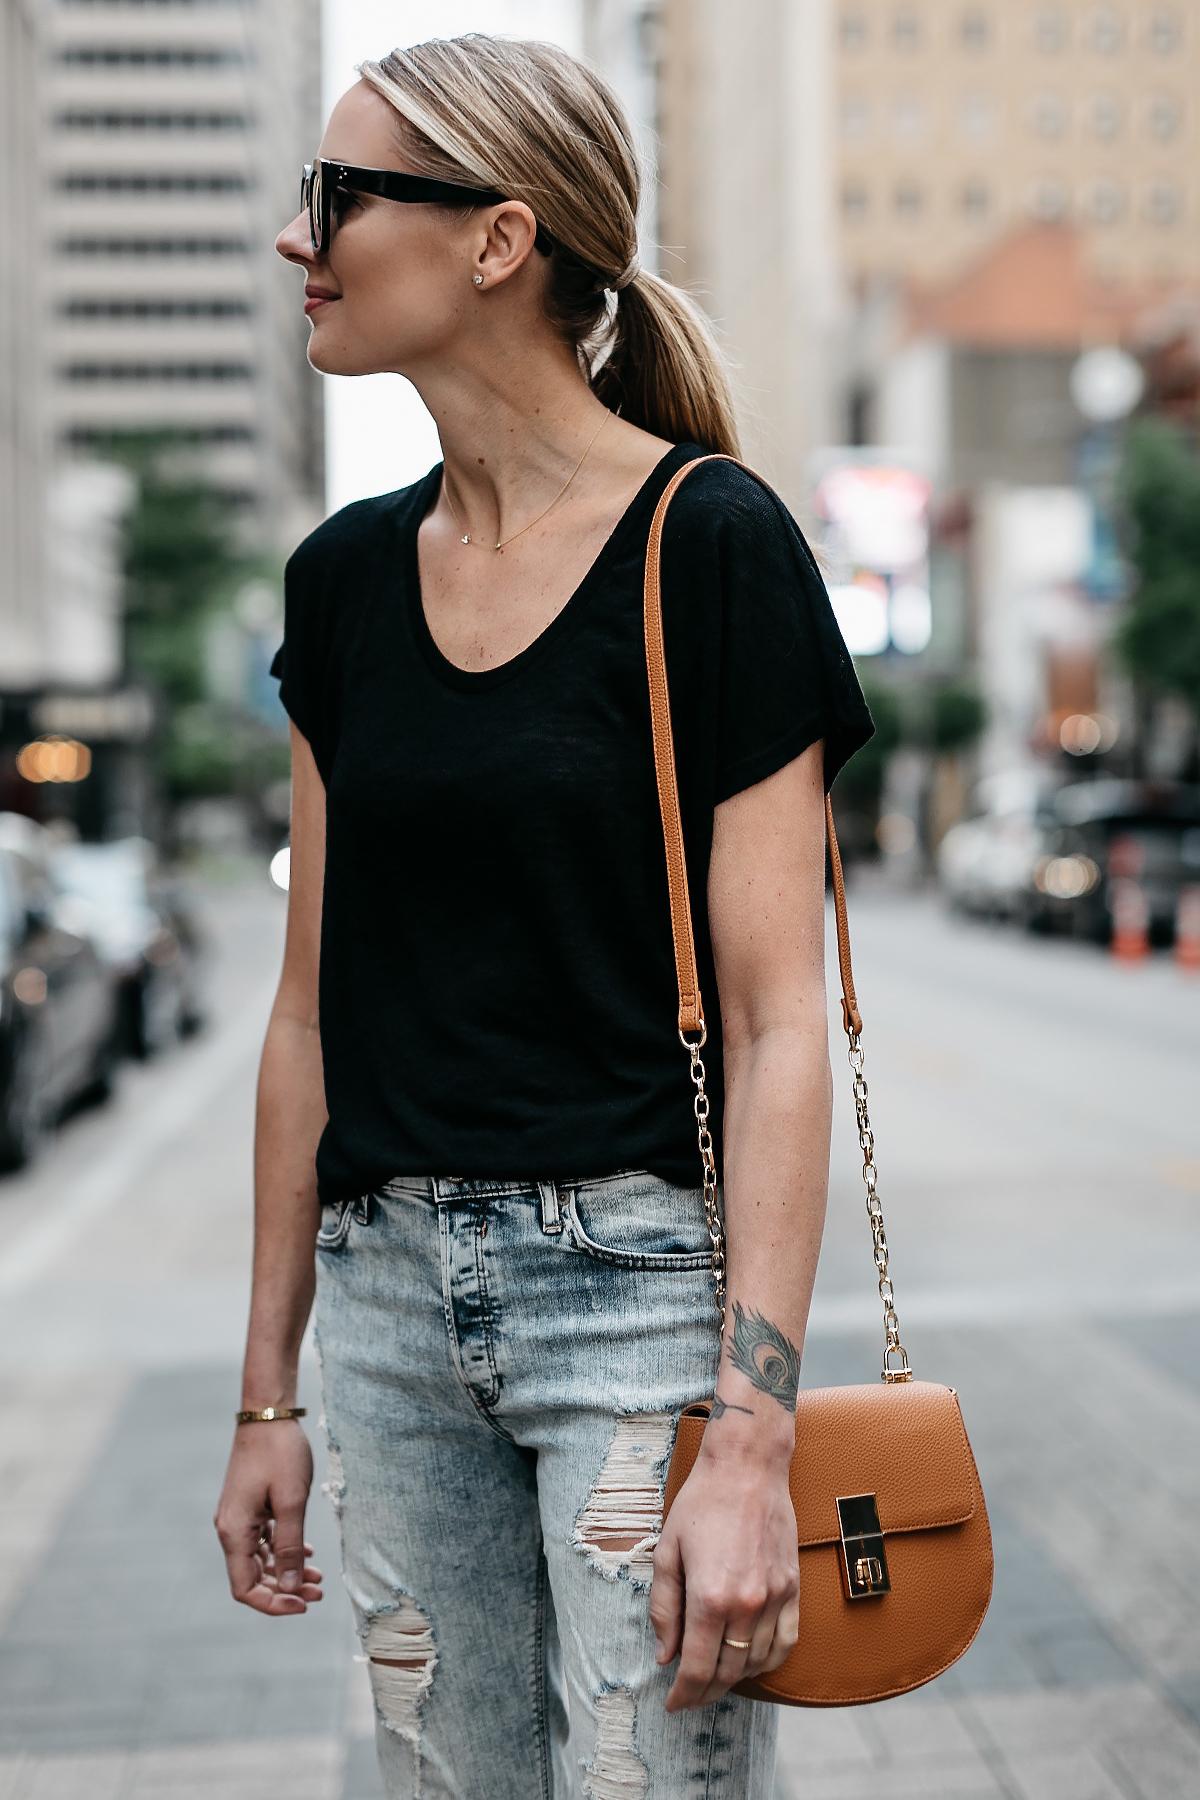 Blonde Woman Wearing Express Black Tshirt Express Ripped Jeans Tan Handbag Fashion Jackson Dallas Blogger Fashion Blogger Street Style